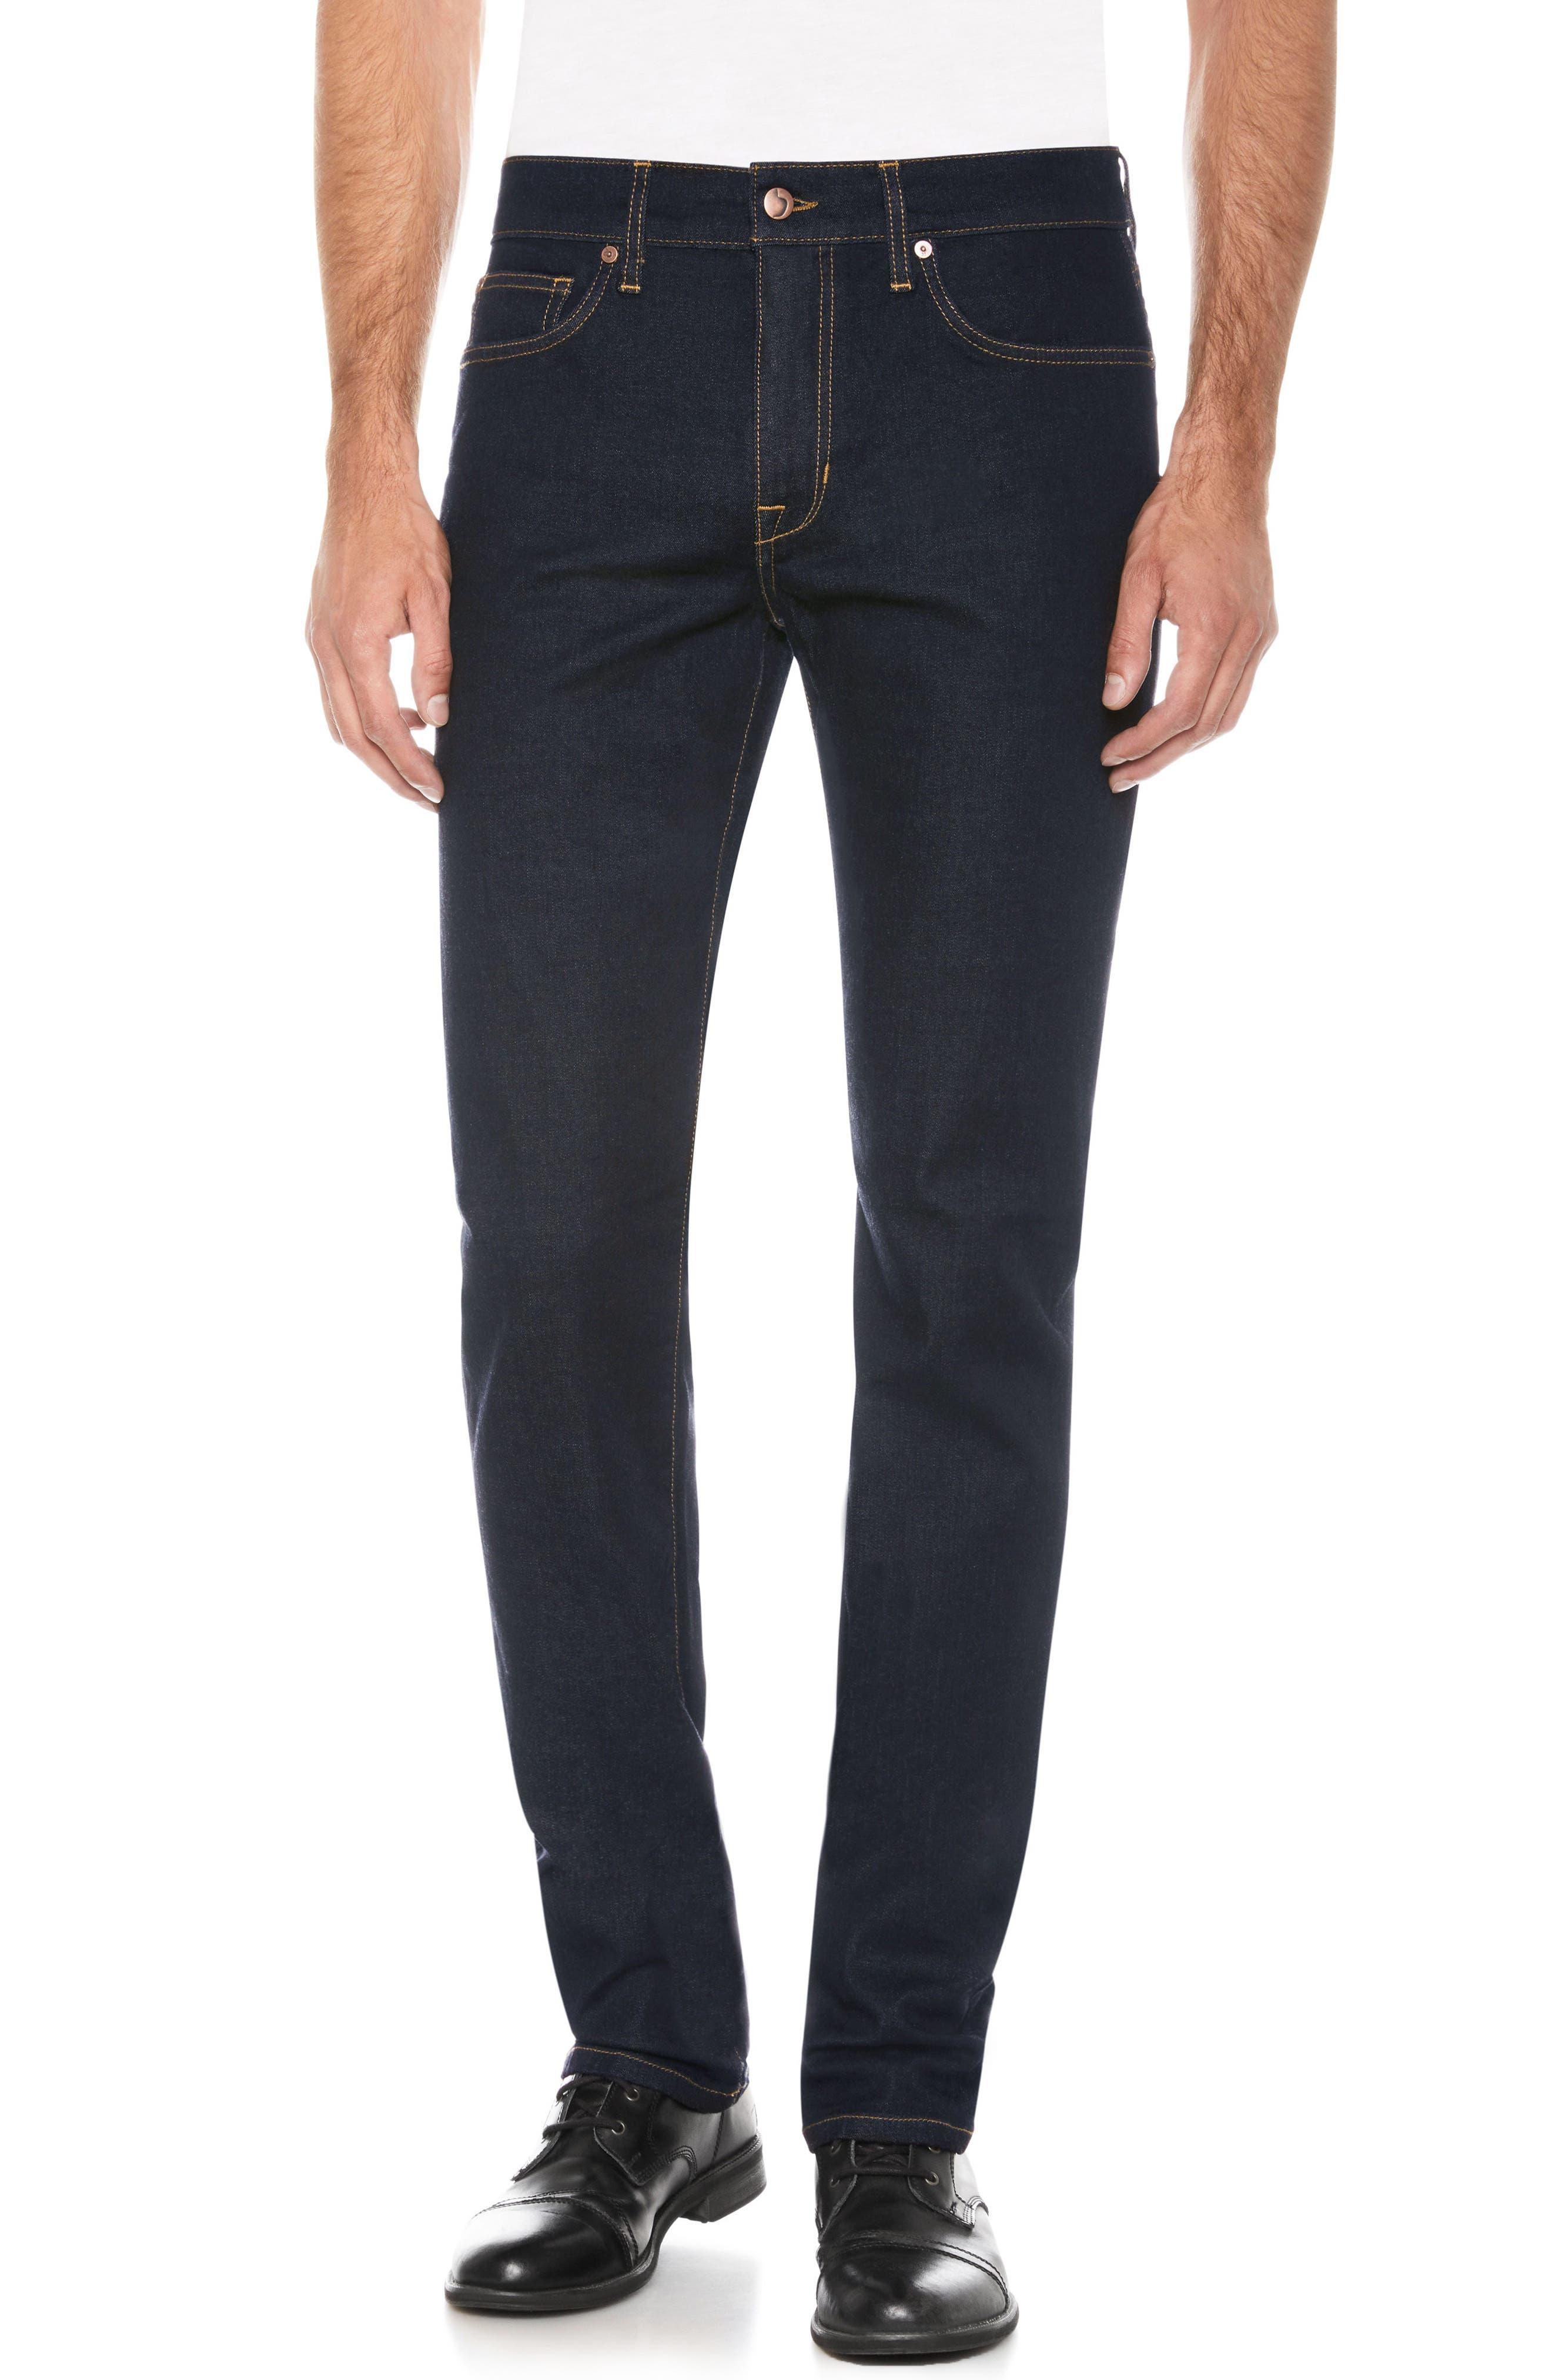 Brixton Slim Straight Fit Jeans,                             Main thumbnail 1, color,                             Jazz